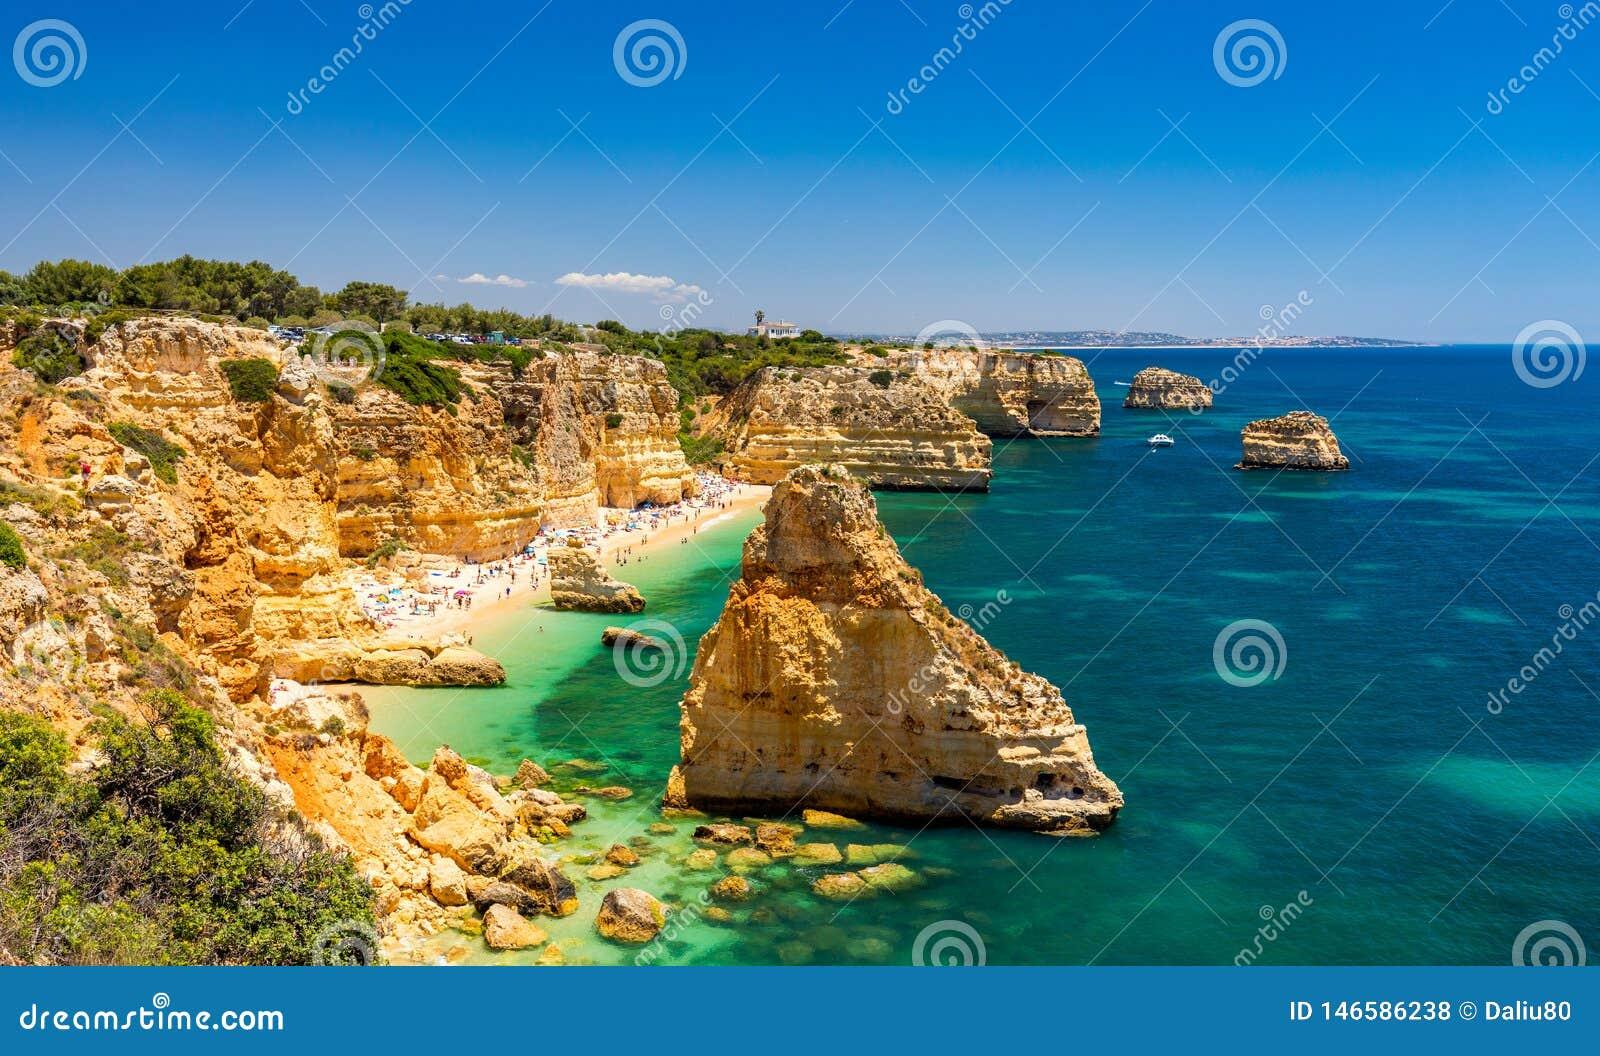 Praia DA Marinha, playa hermosa Marinha en Algarve, Portugal Playa de la marina de guerra (Praia DA Marinha), una de las playas m